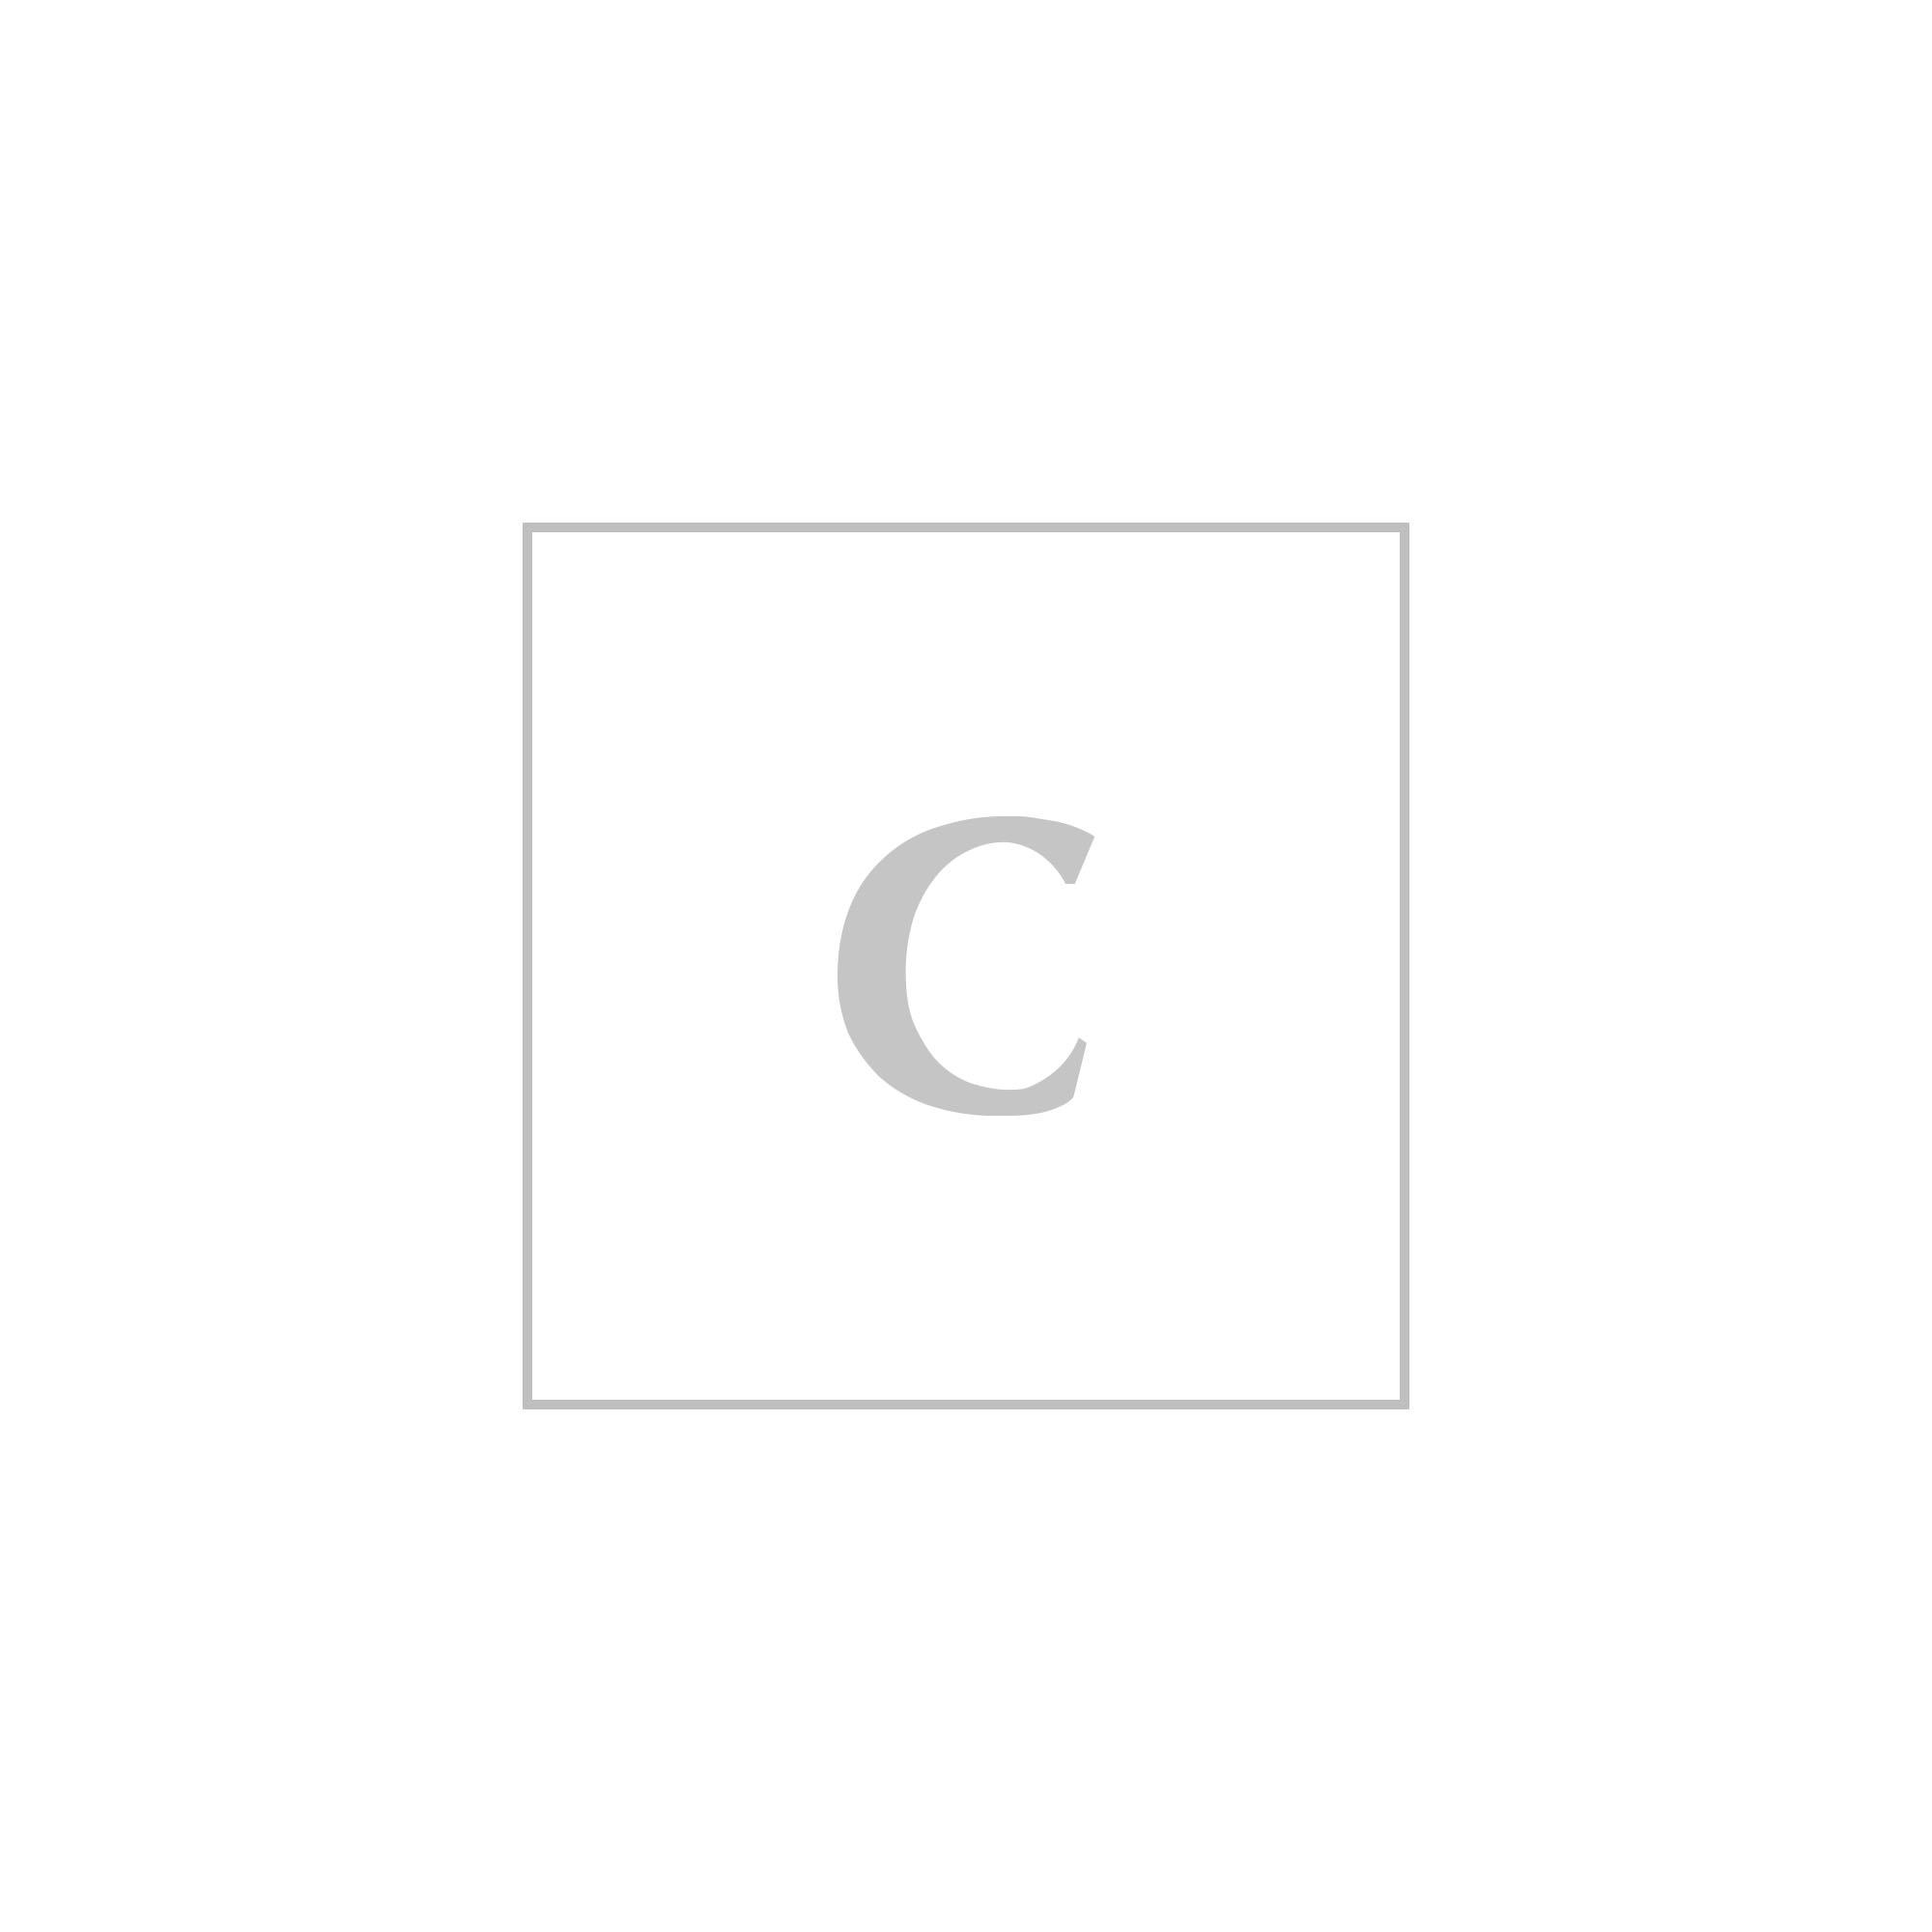 9d2c4331b2 Mcm borsa patricia mezzanin visetos e pelle